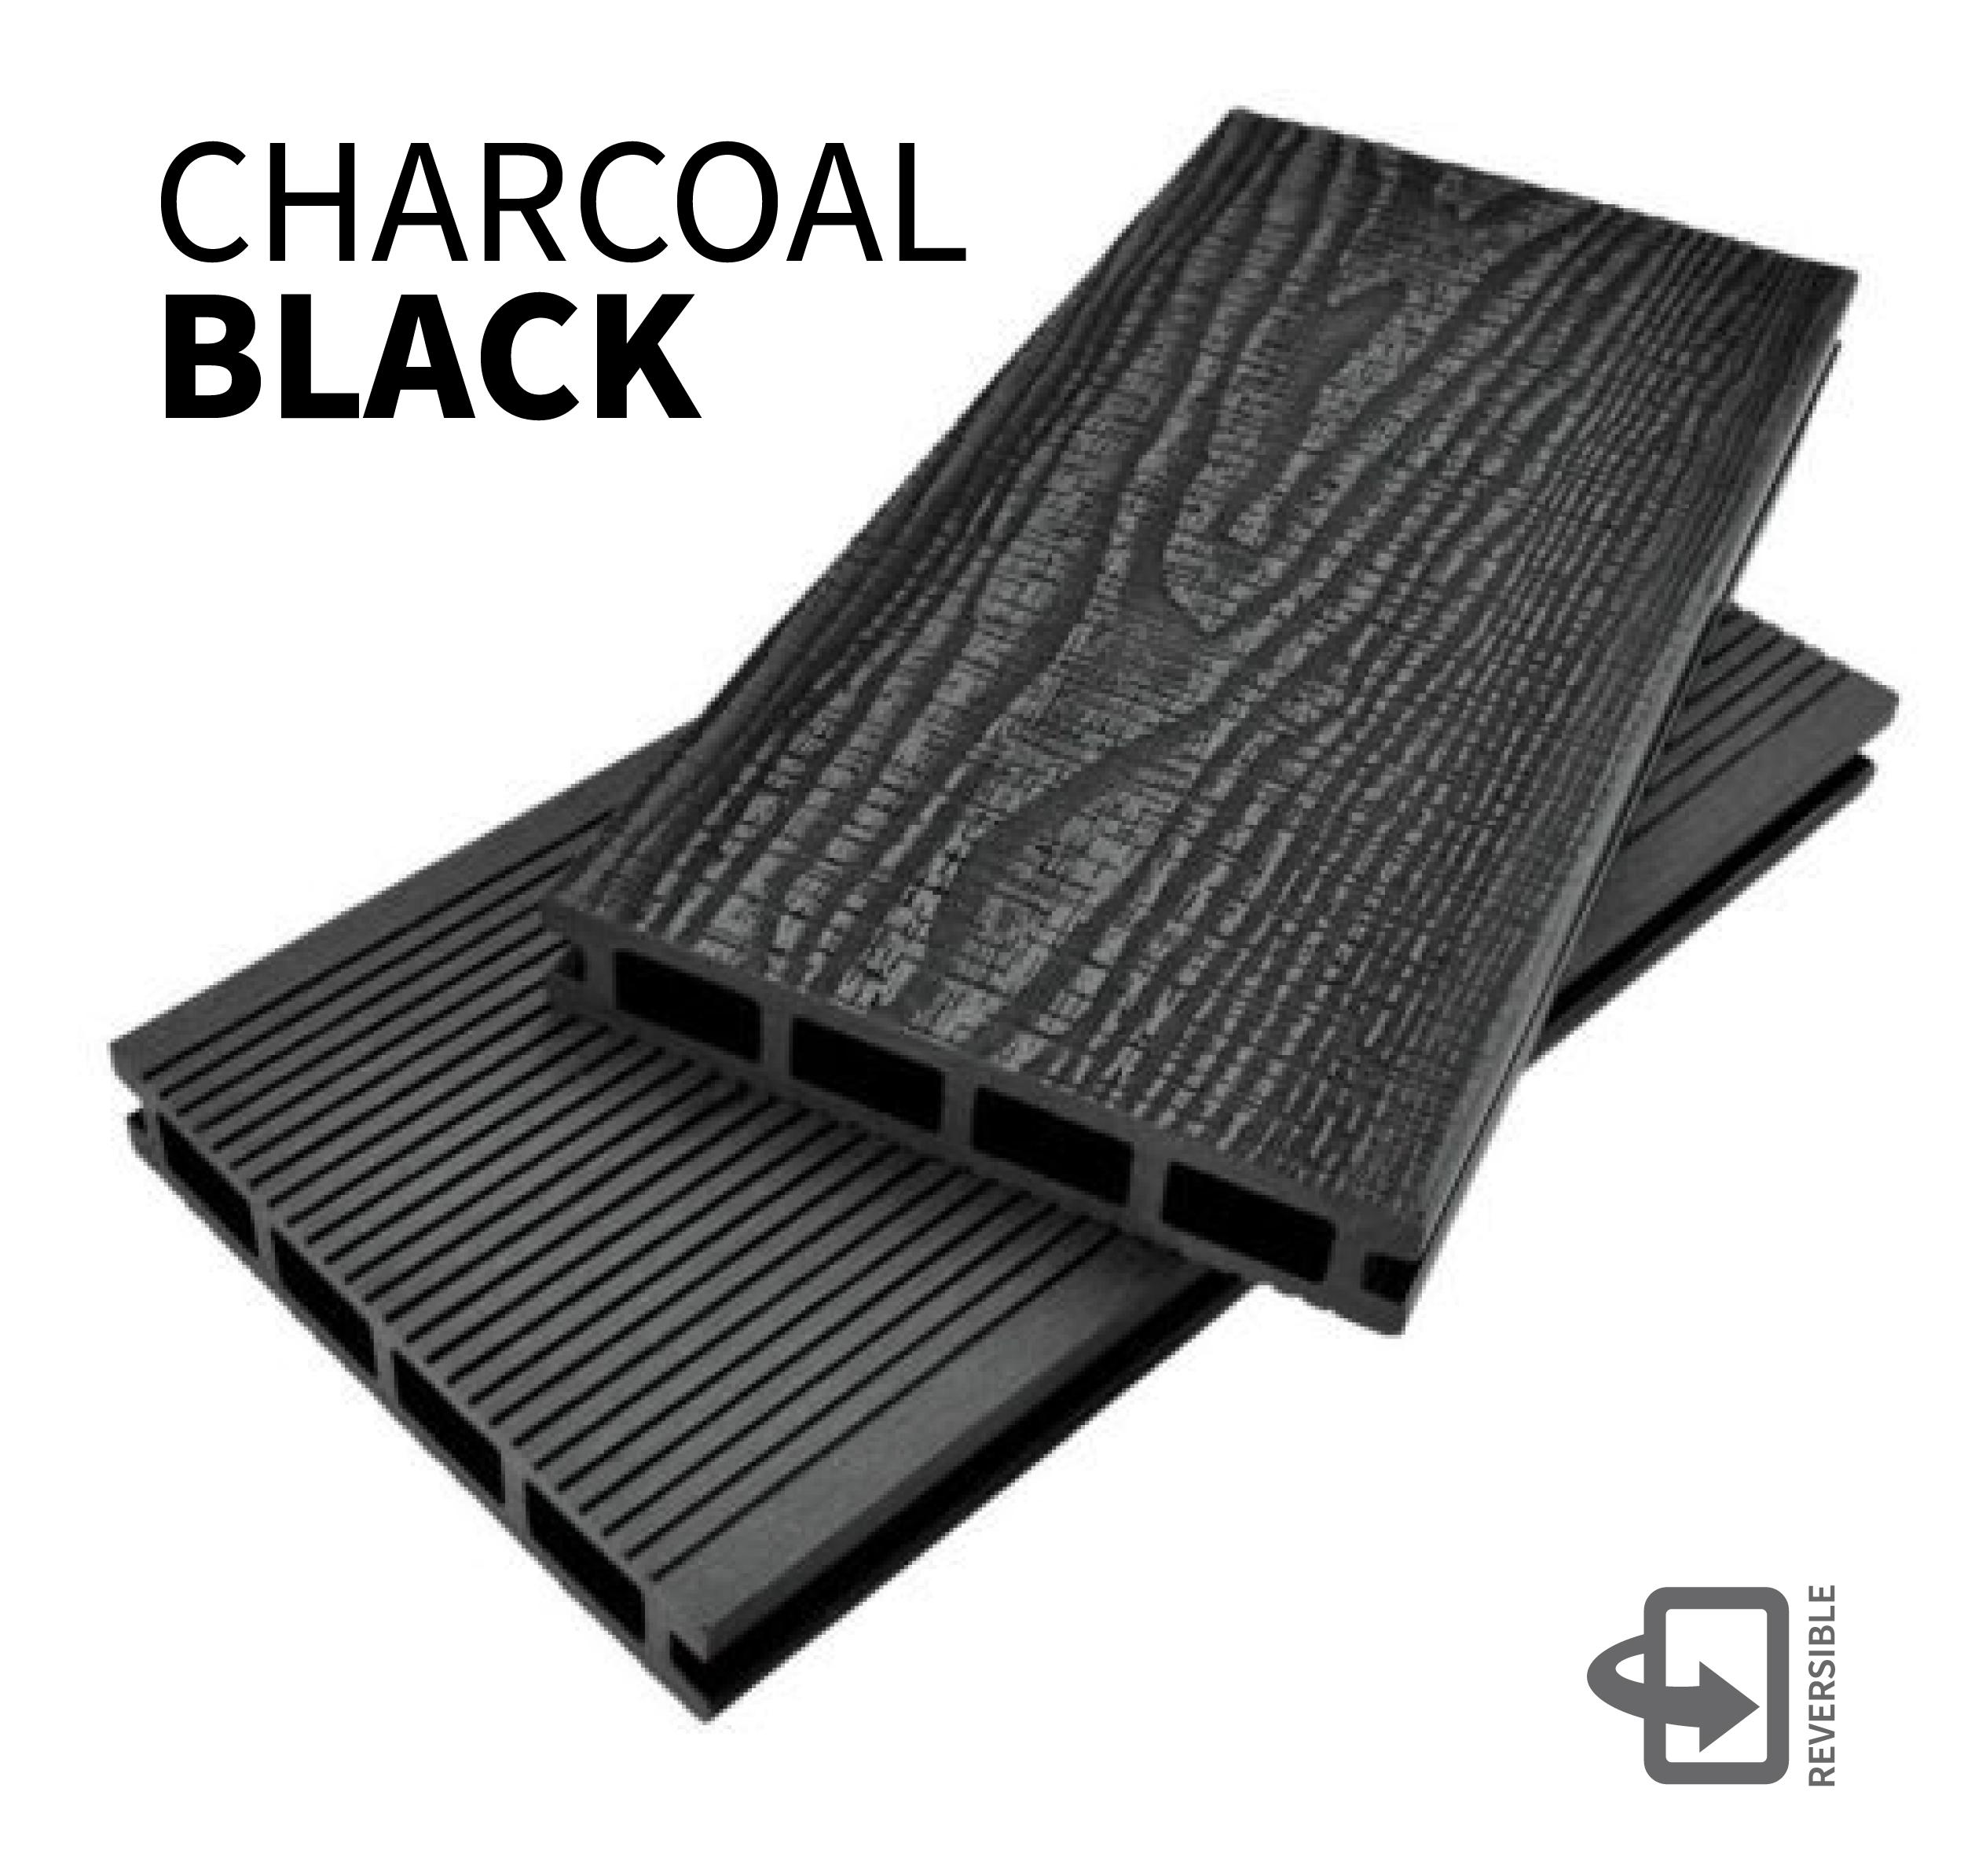 CHARCOAL BLACK